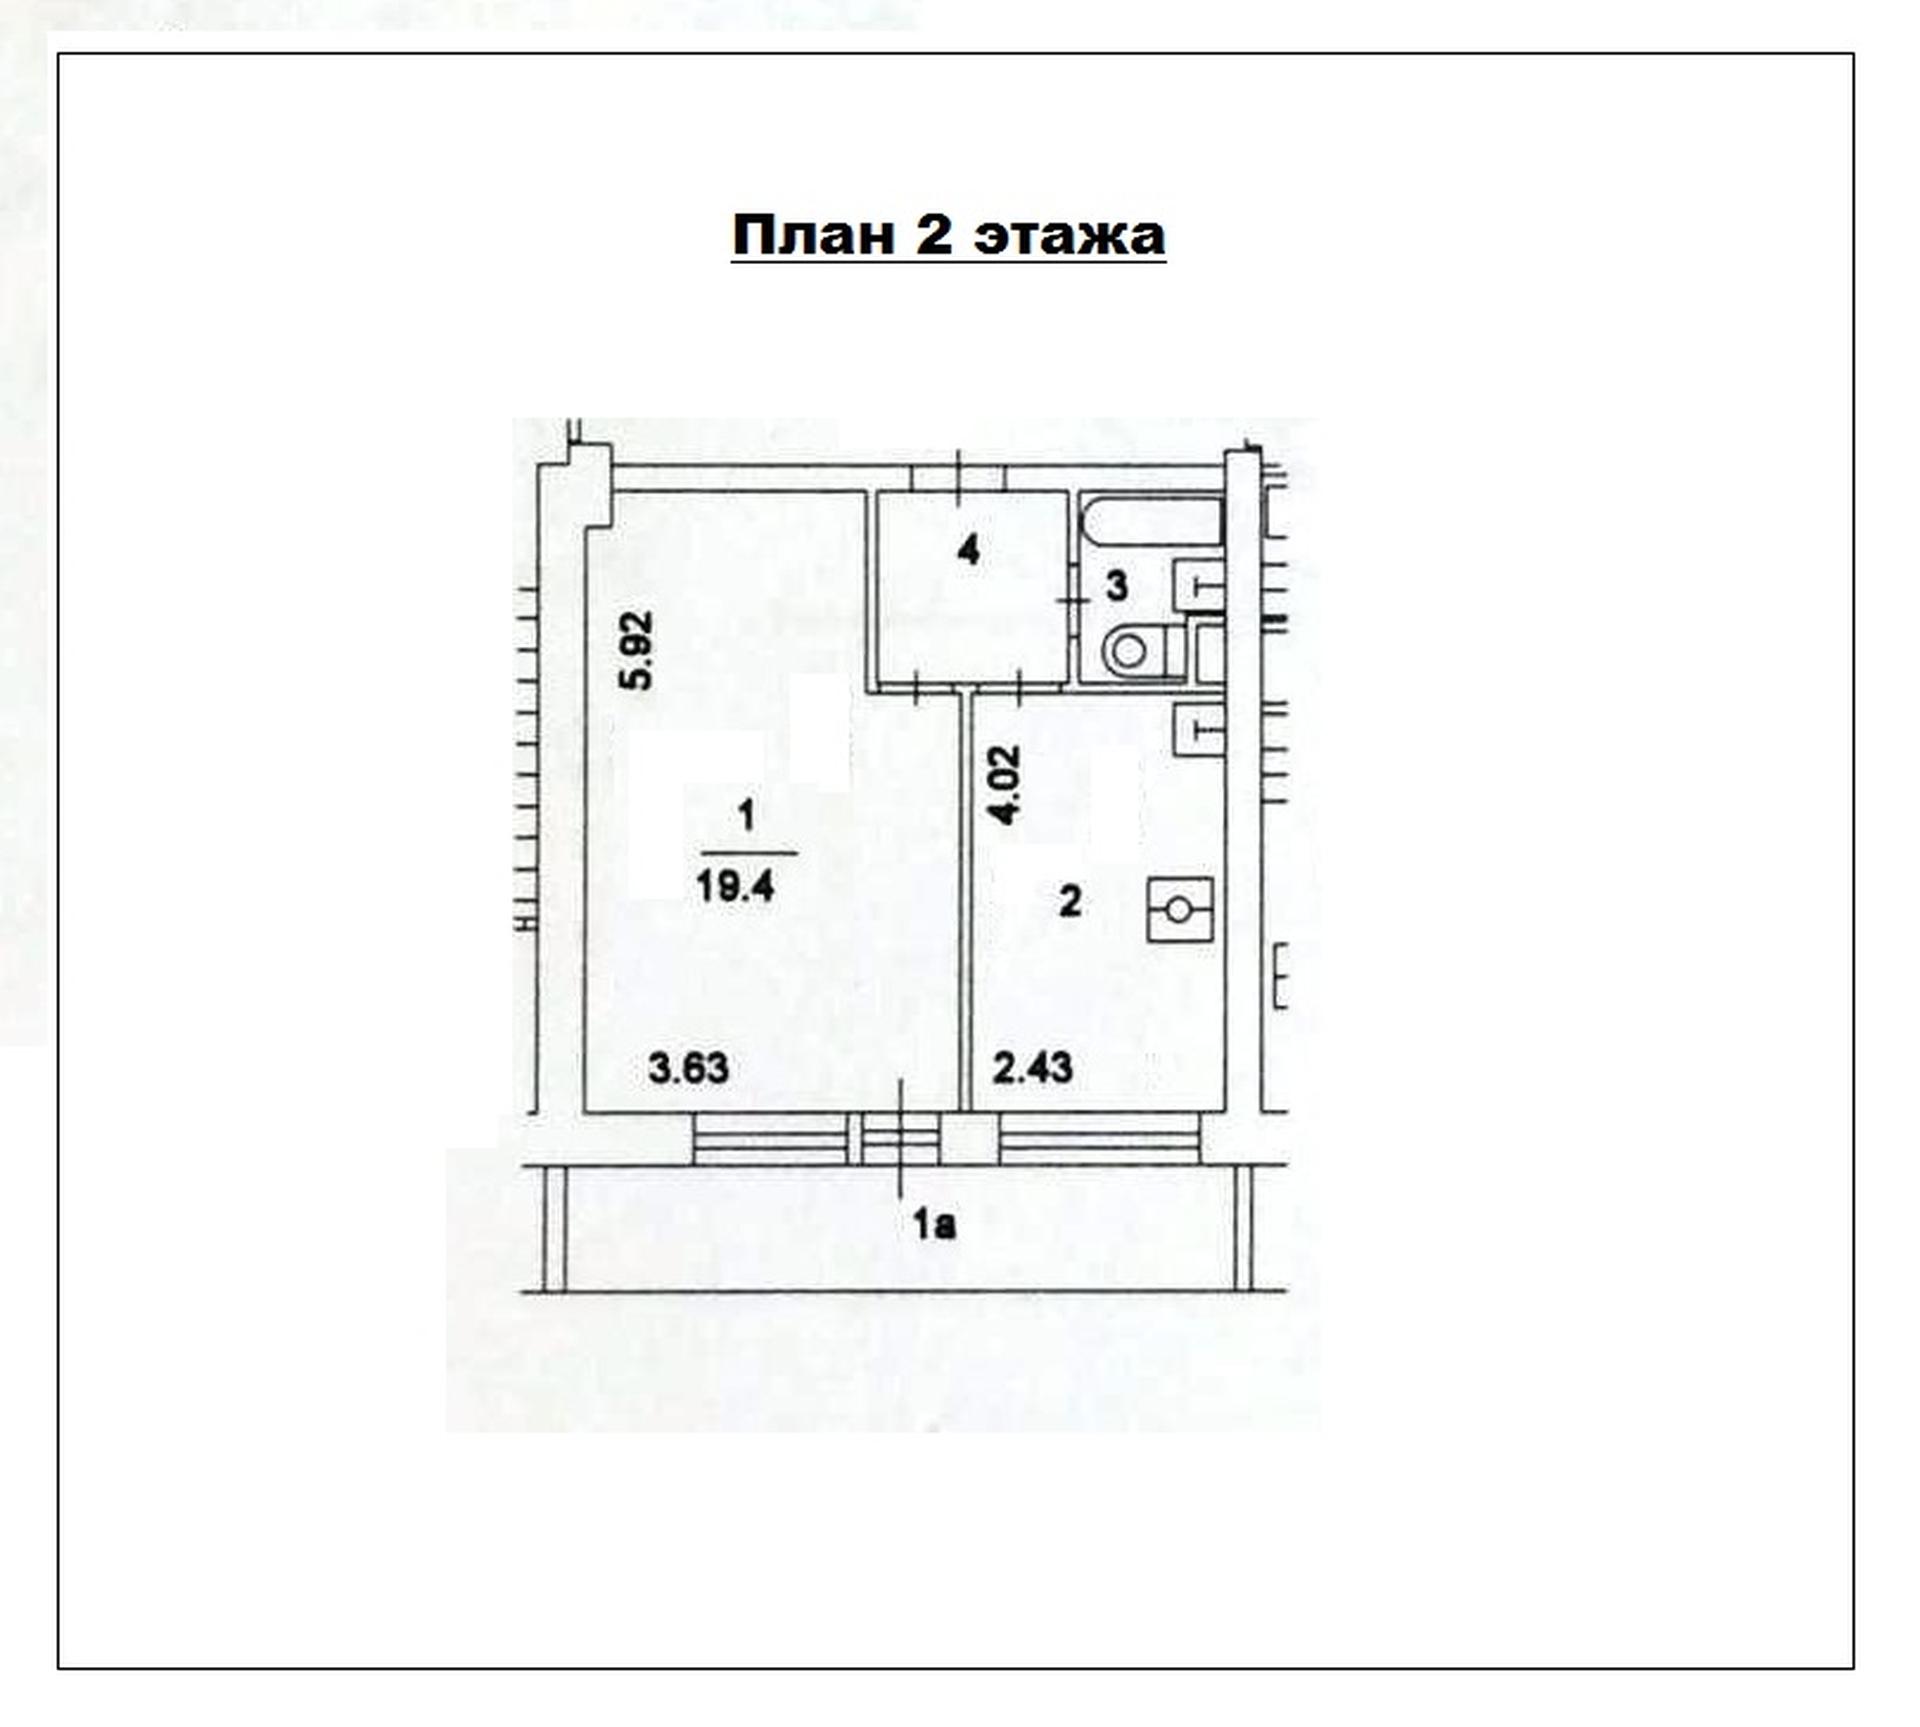 Лоджия 6 кв.м.! 2